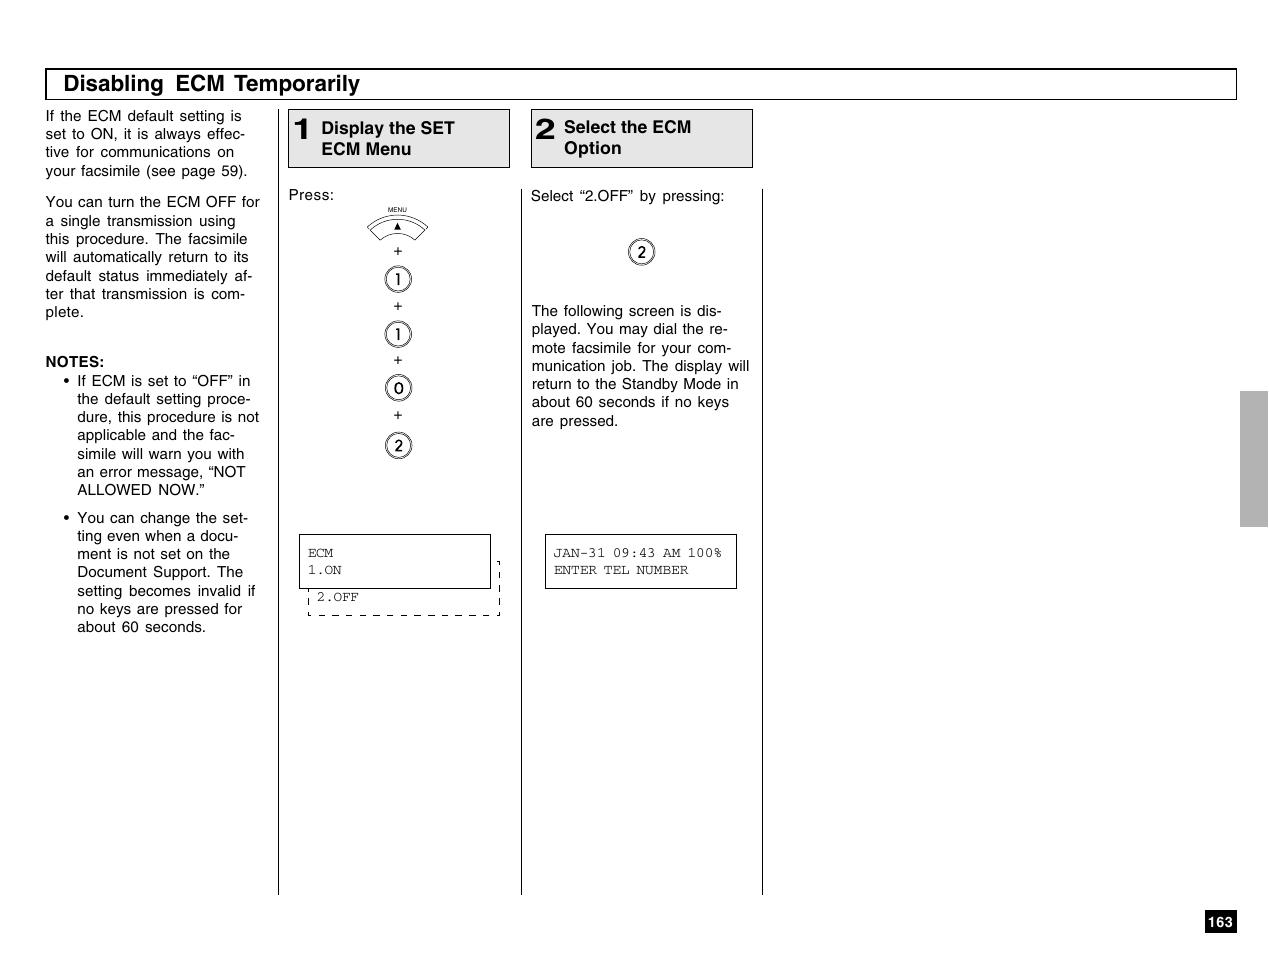 Disabling ecm temporarily | Toshiba e-STUDIO 170F User